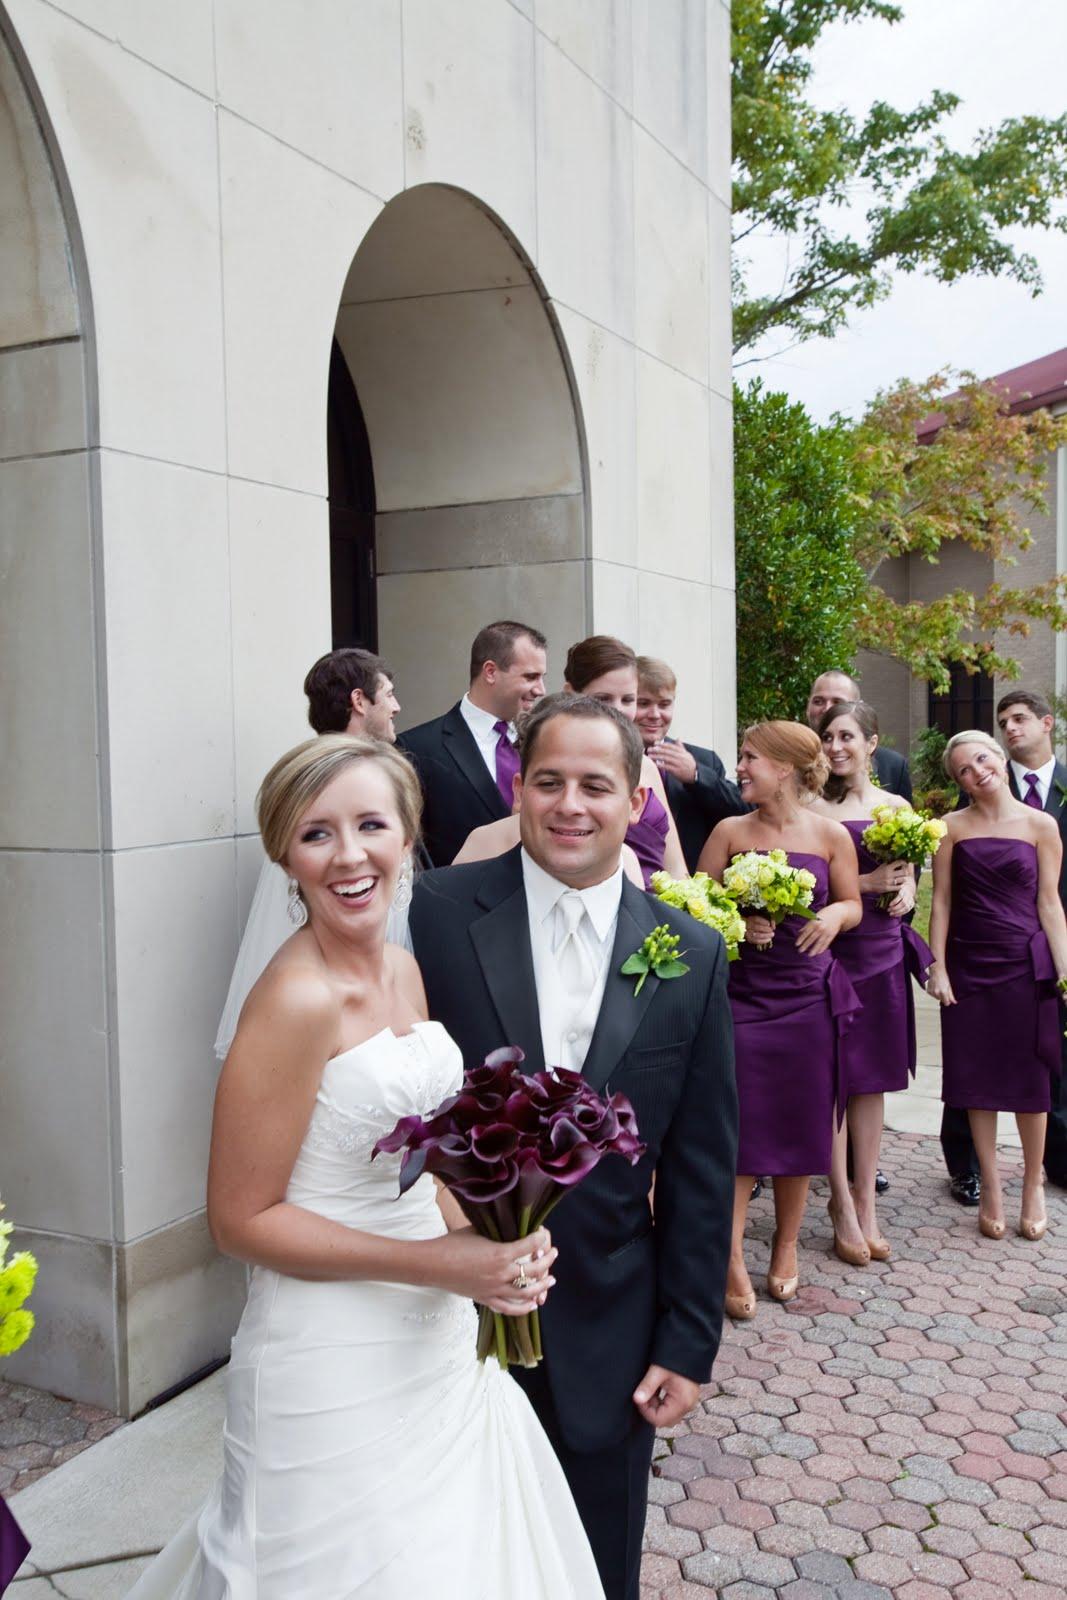 Lifes Little Lustings: Our Big Fat Italian Wedding